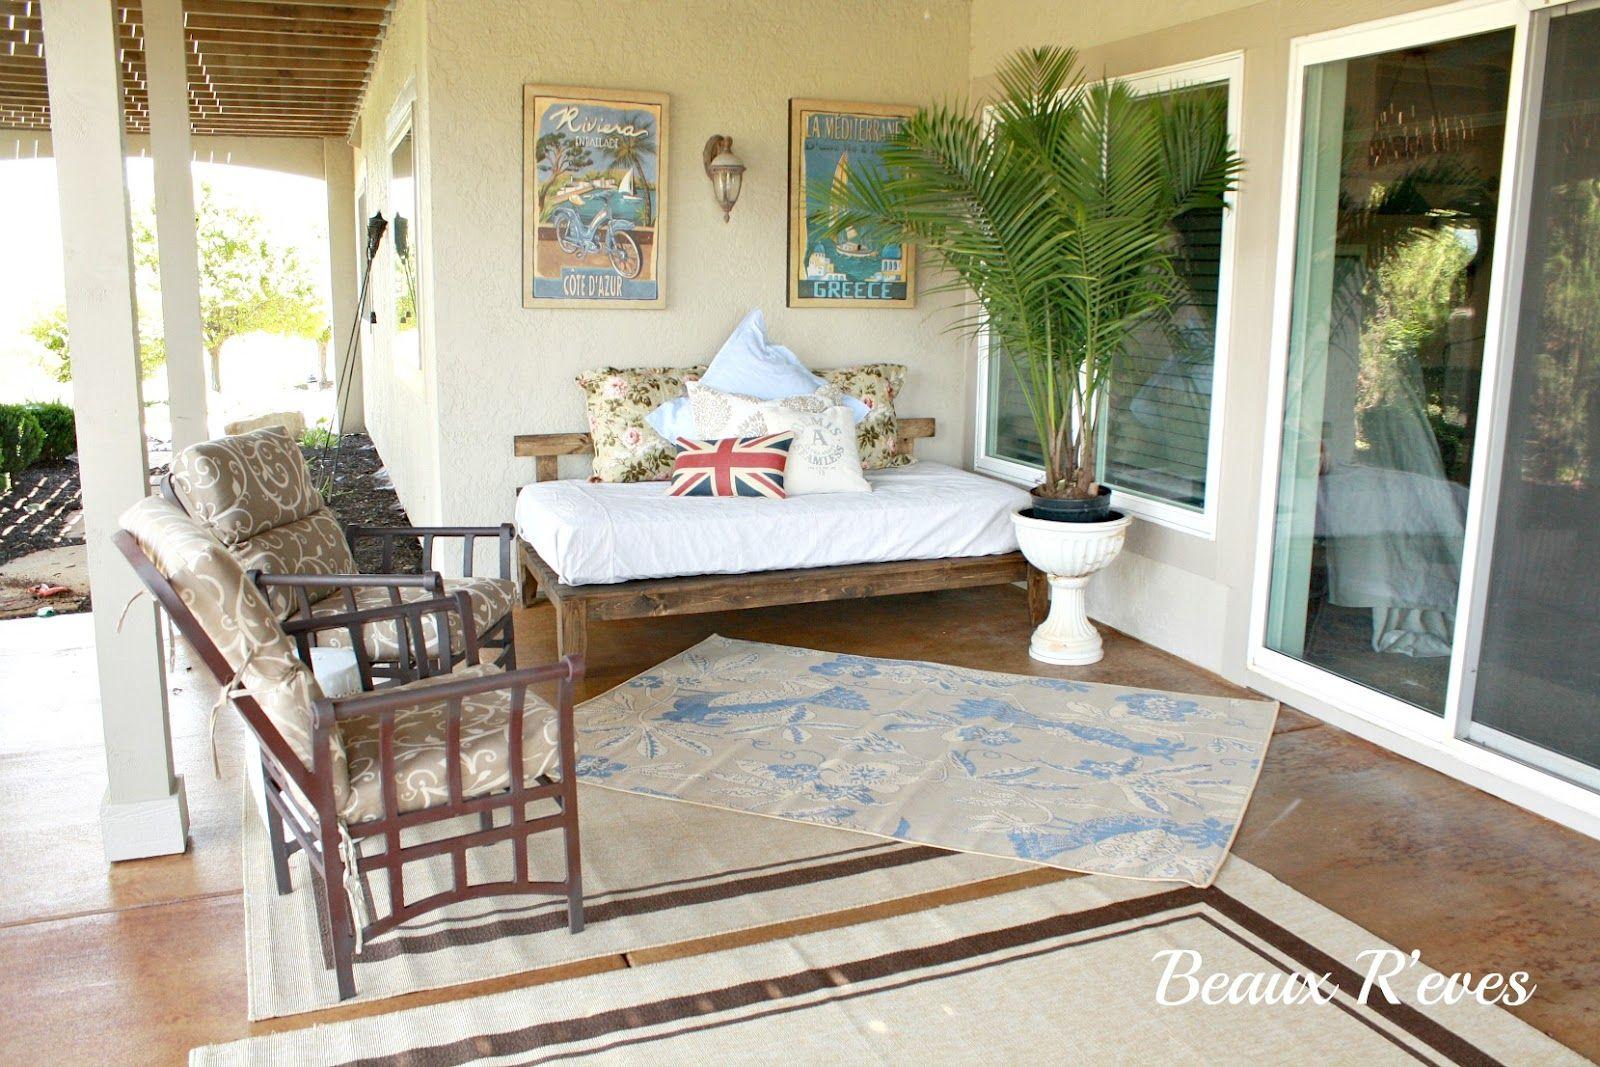 Outdoor Daybed Patio Summer | Relaxing outdoor spaces ... on Living Spaces Outdoor Daybed id=96761